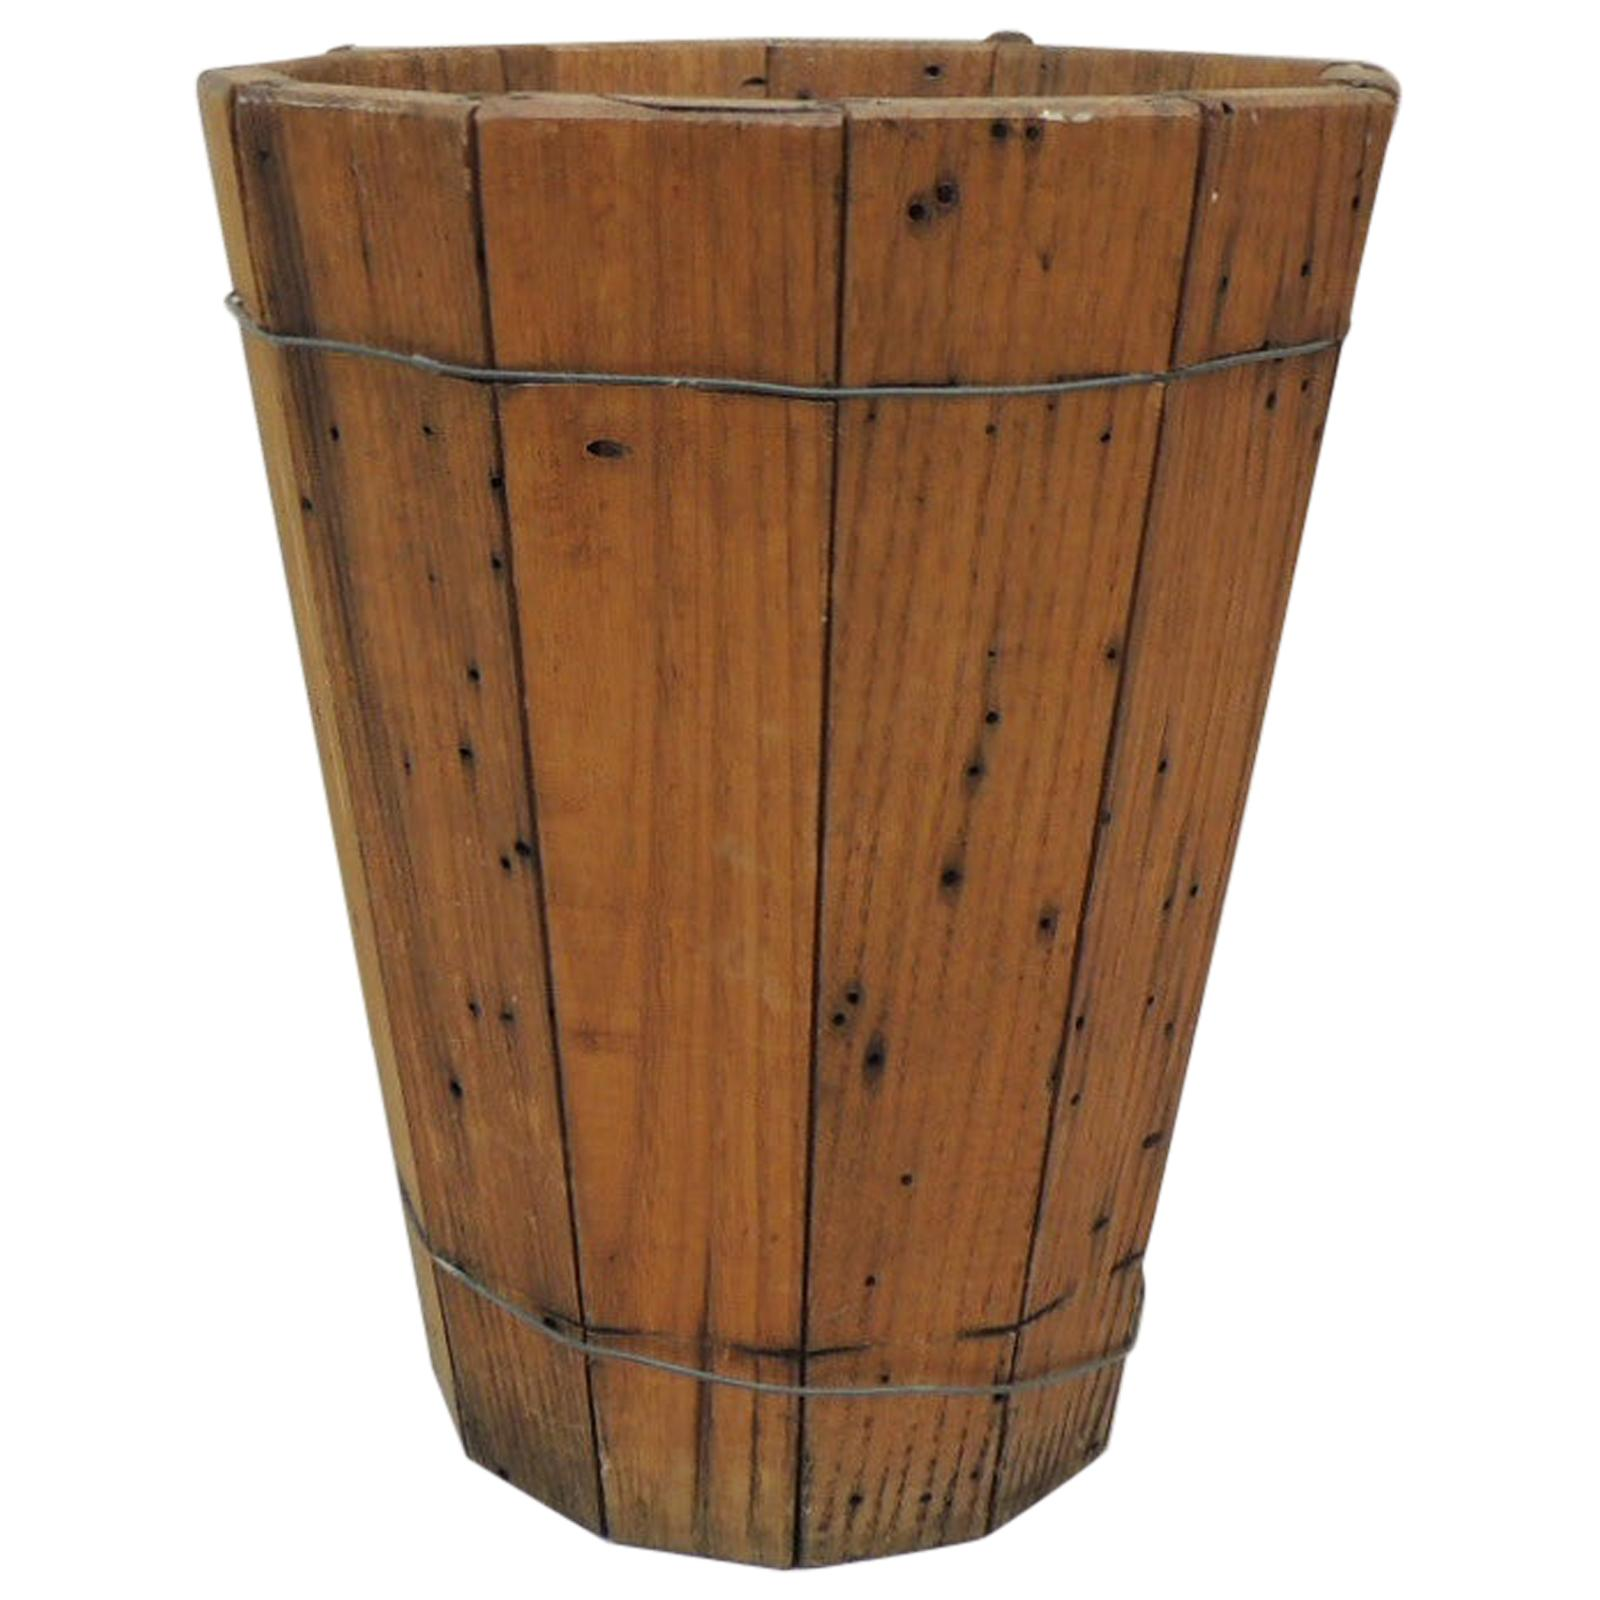 Vintage Artisanal Wood and Wire Barrel Style Wastebasket